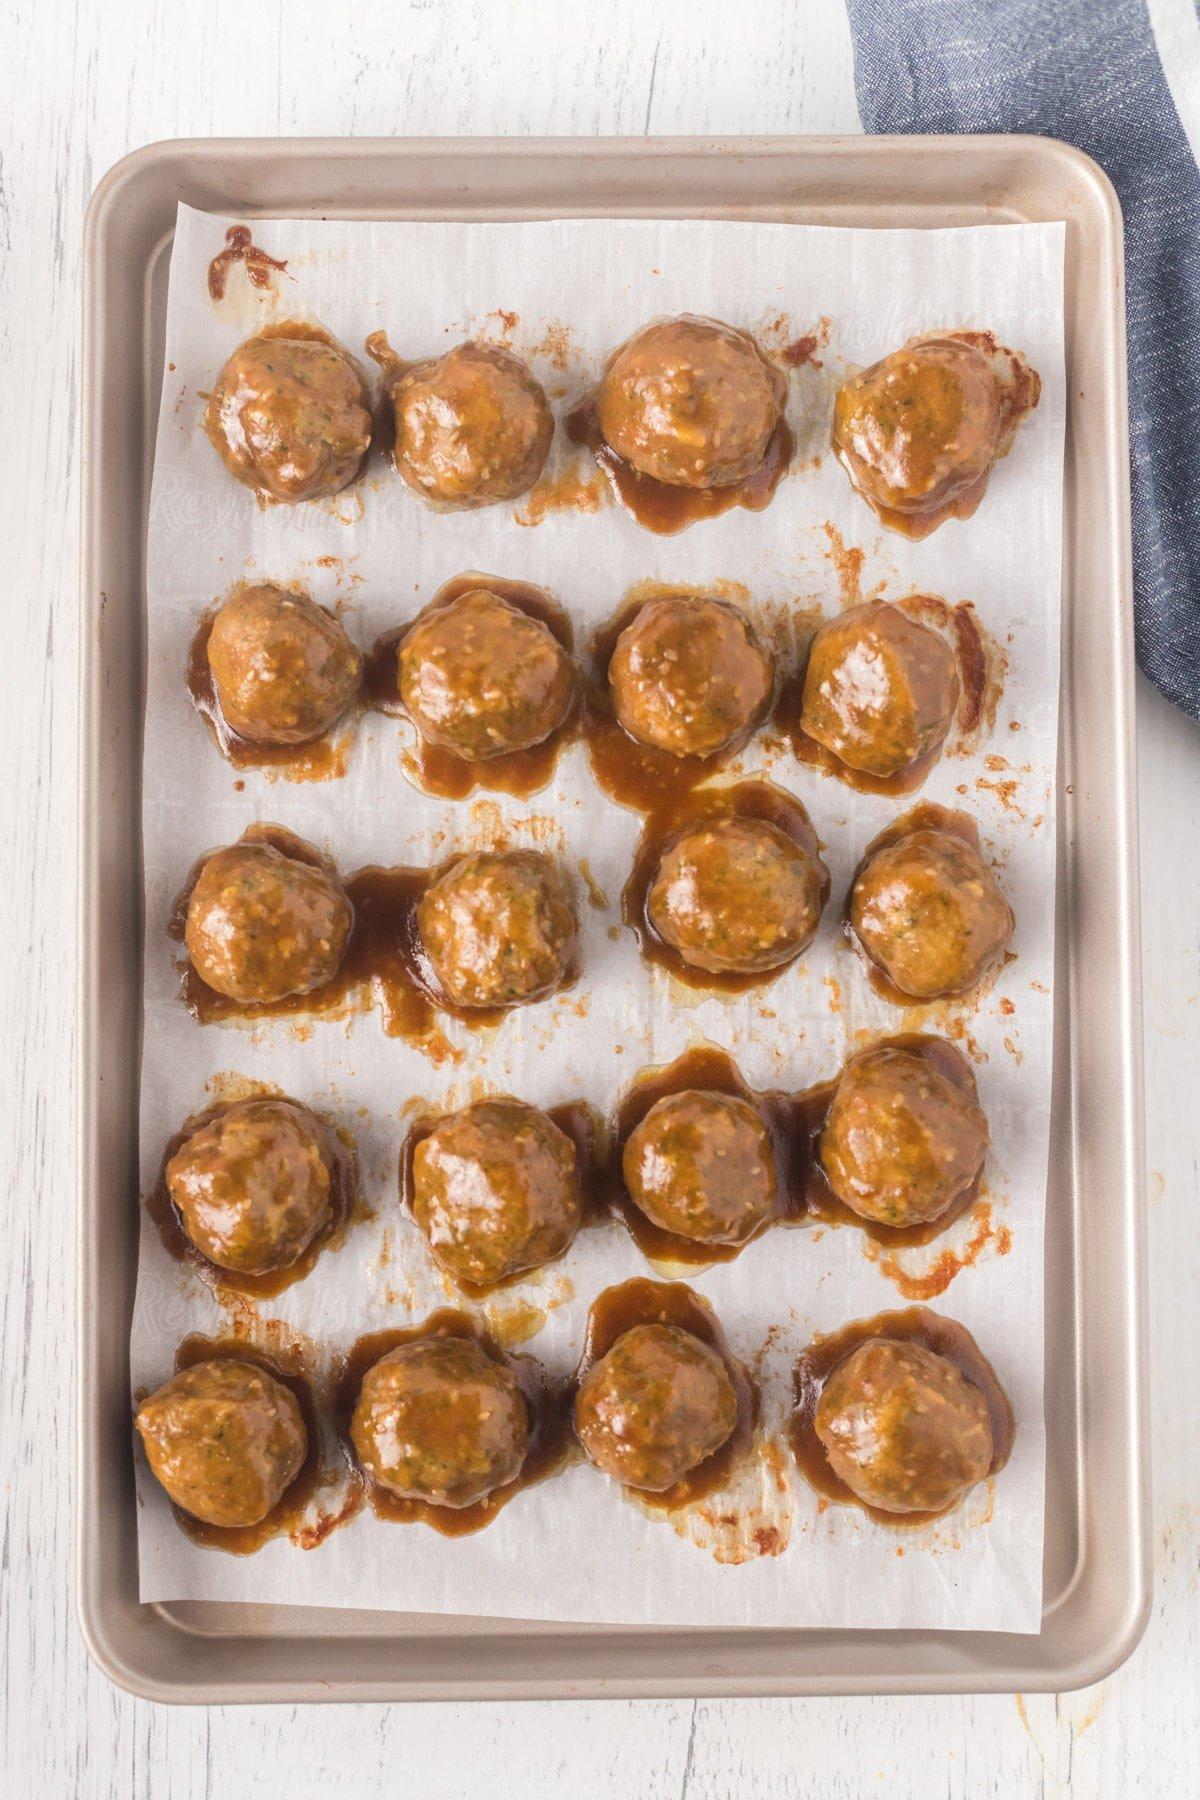 Baked turkey meatballs covered in teriyaki sauce on a baking sheet